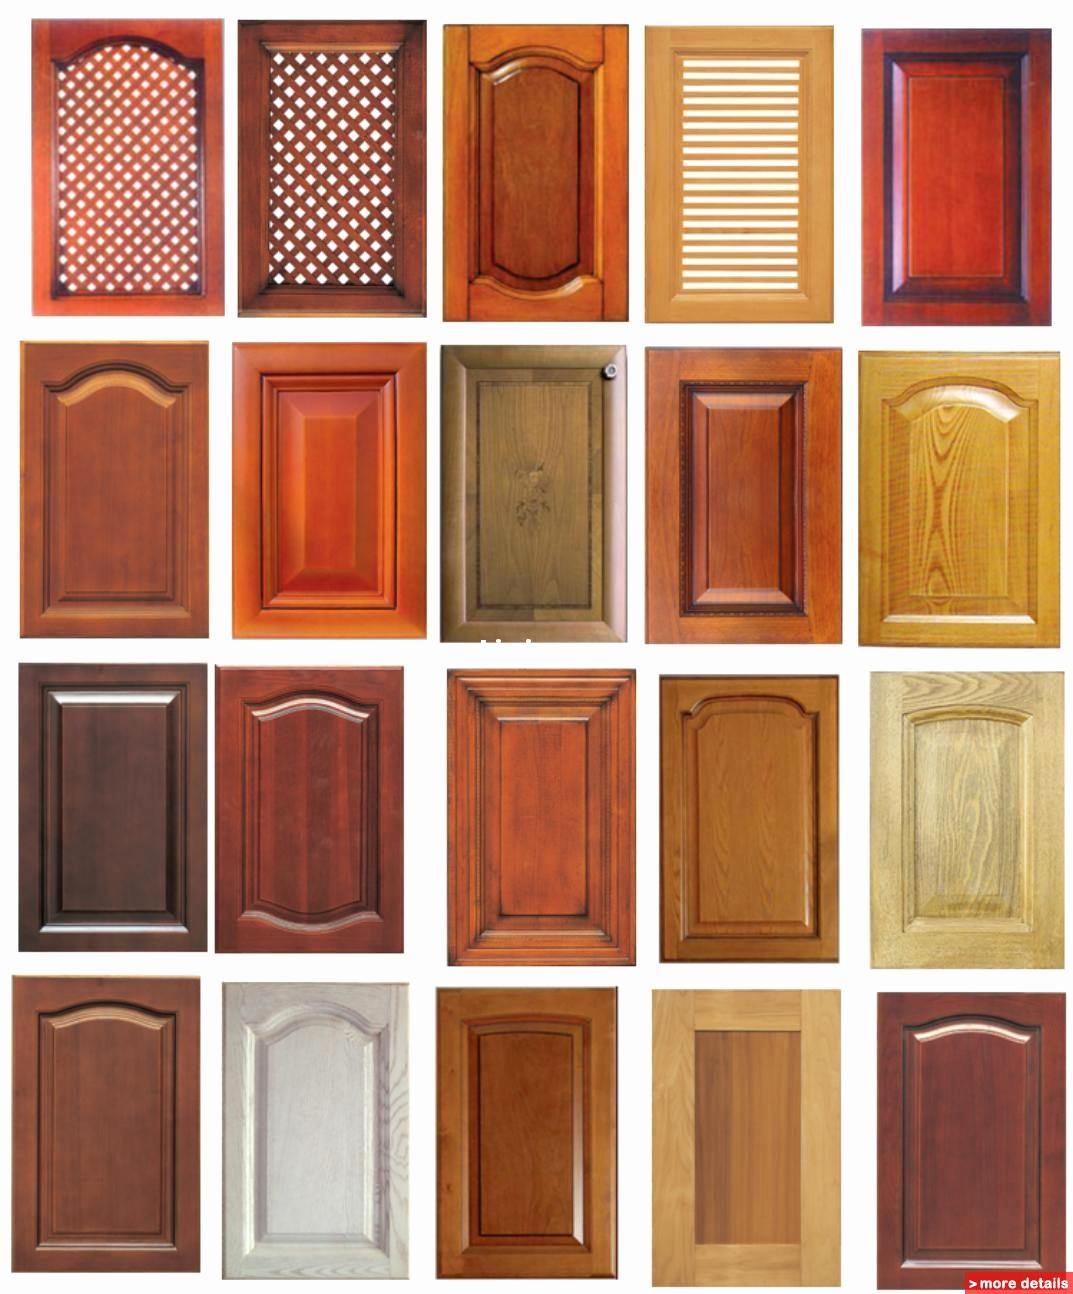 Install New Cabinet Doors